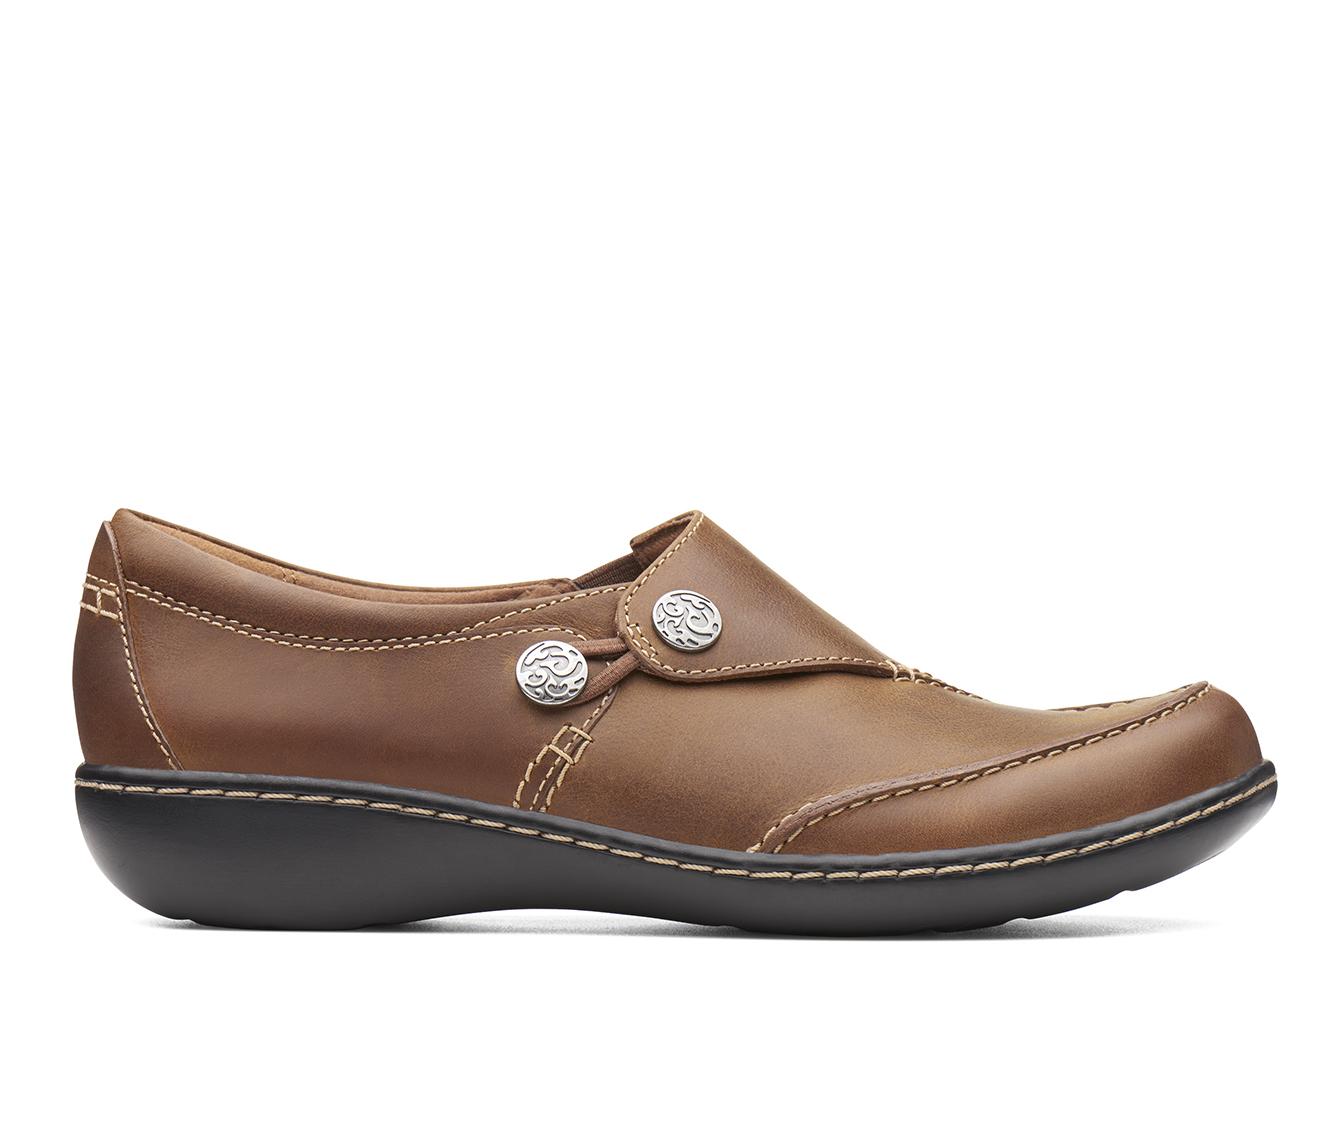 Clarks Ashland Lane Q Women's Shoe (Brown Leather)